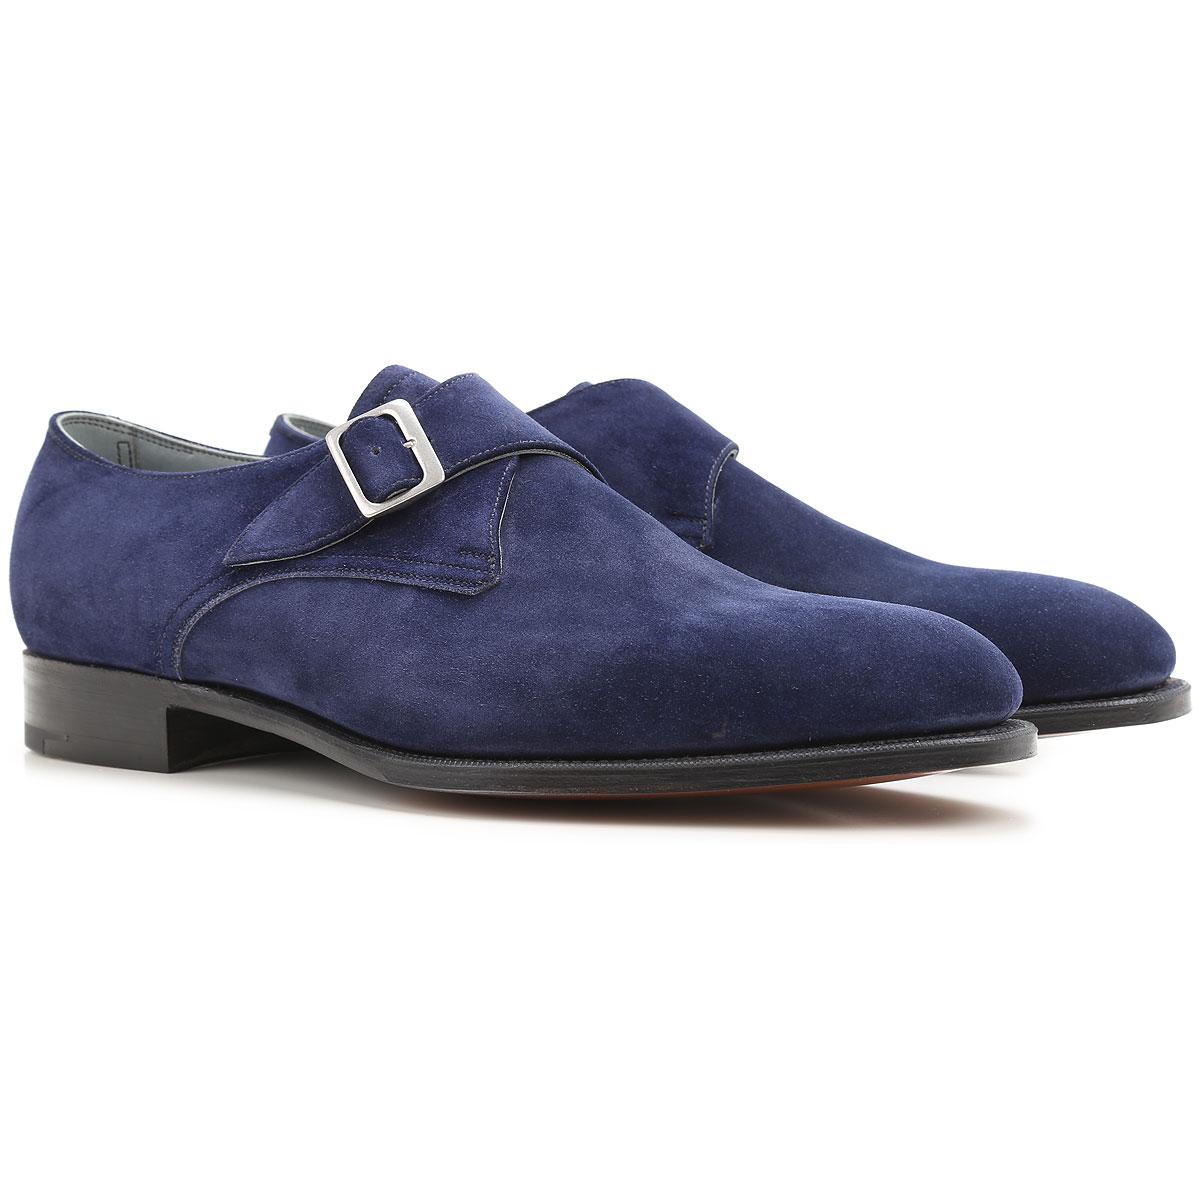 Image of Edward Green Loafers for Men On Sale, Indigo Blue, Suede leather, 2017, UK 7.5 - 8 UK 8 - 8.5